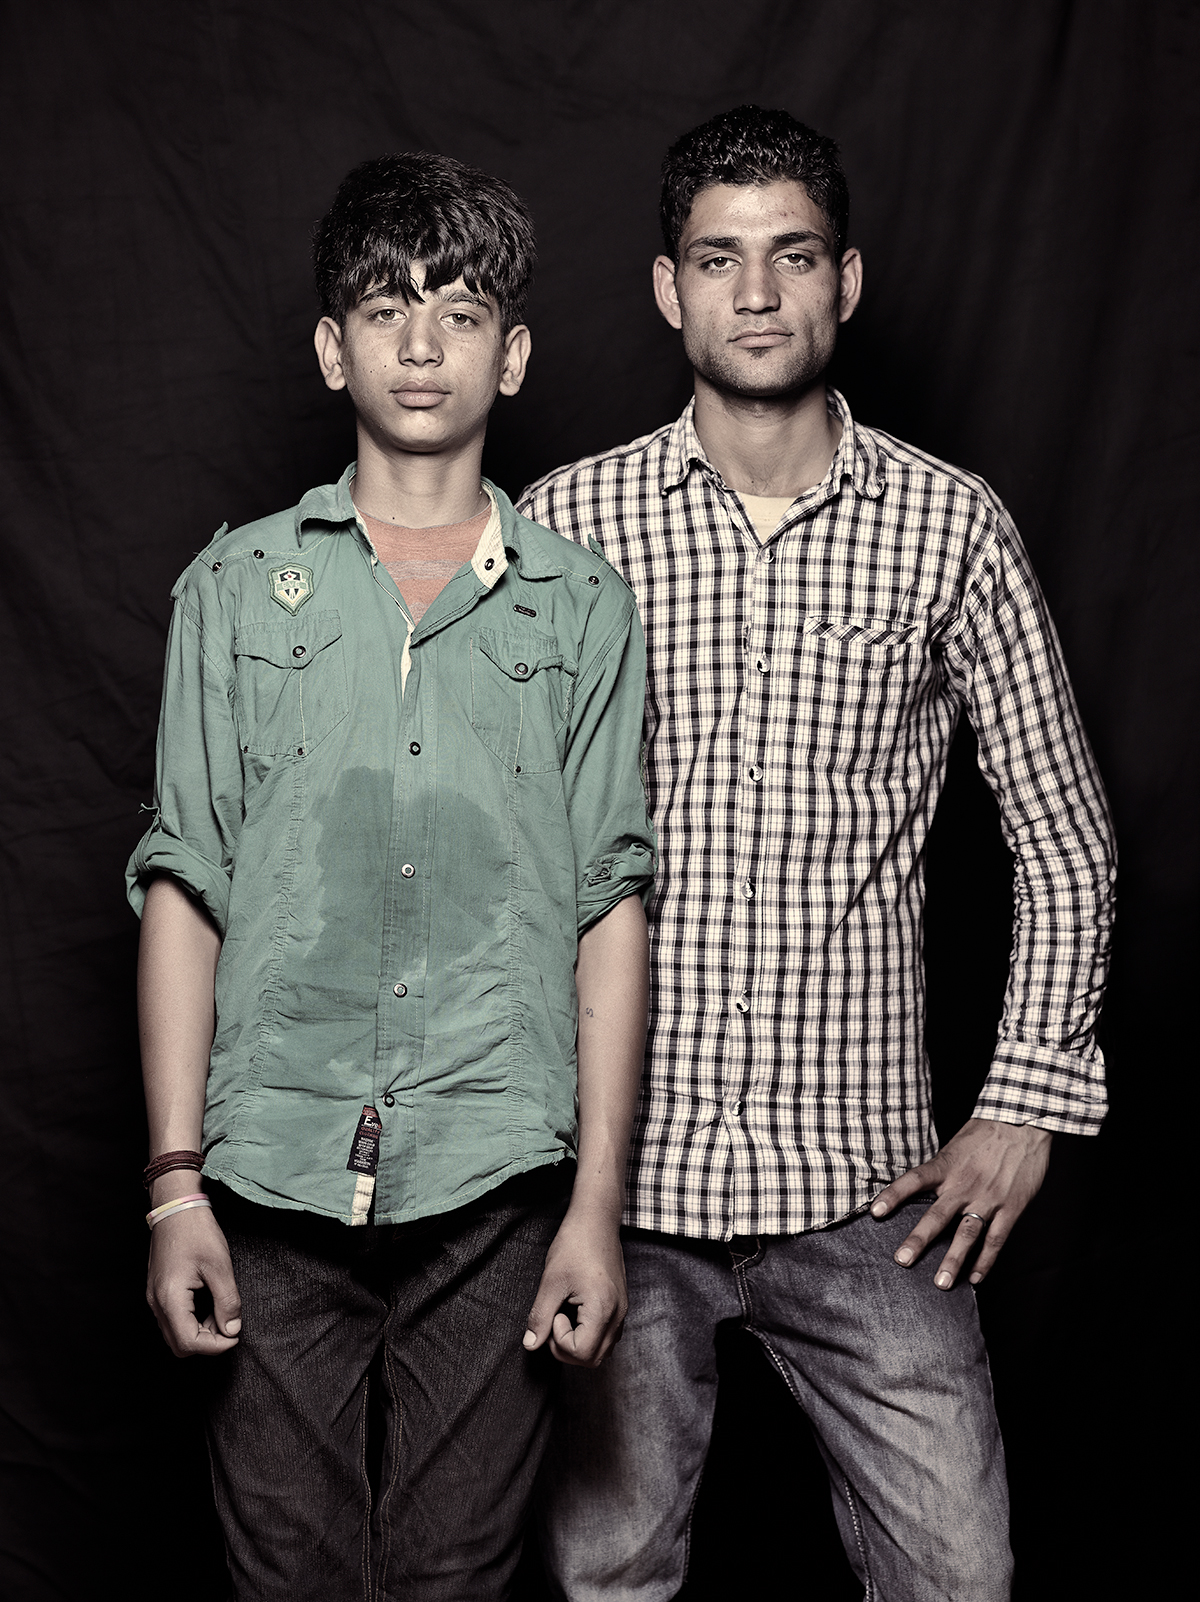 Omar Shah, 14 and Sunil Bhutt, 21, D-camp, 2013